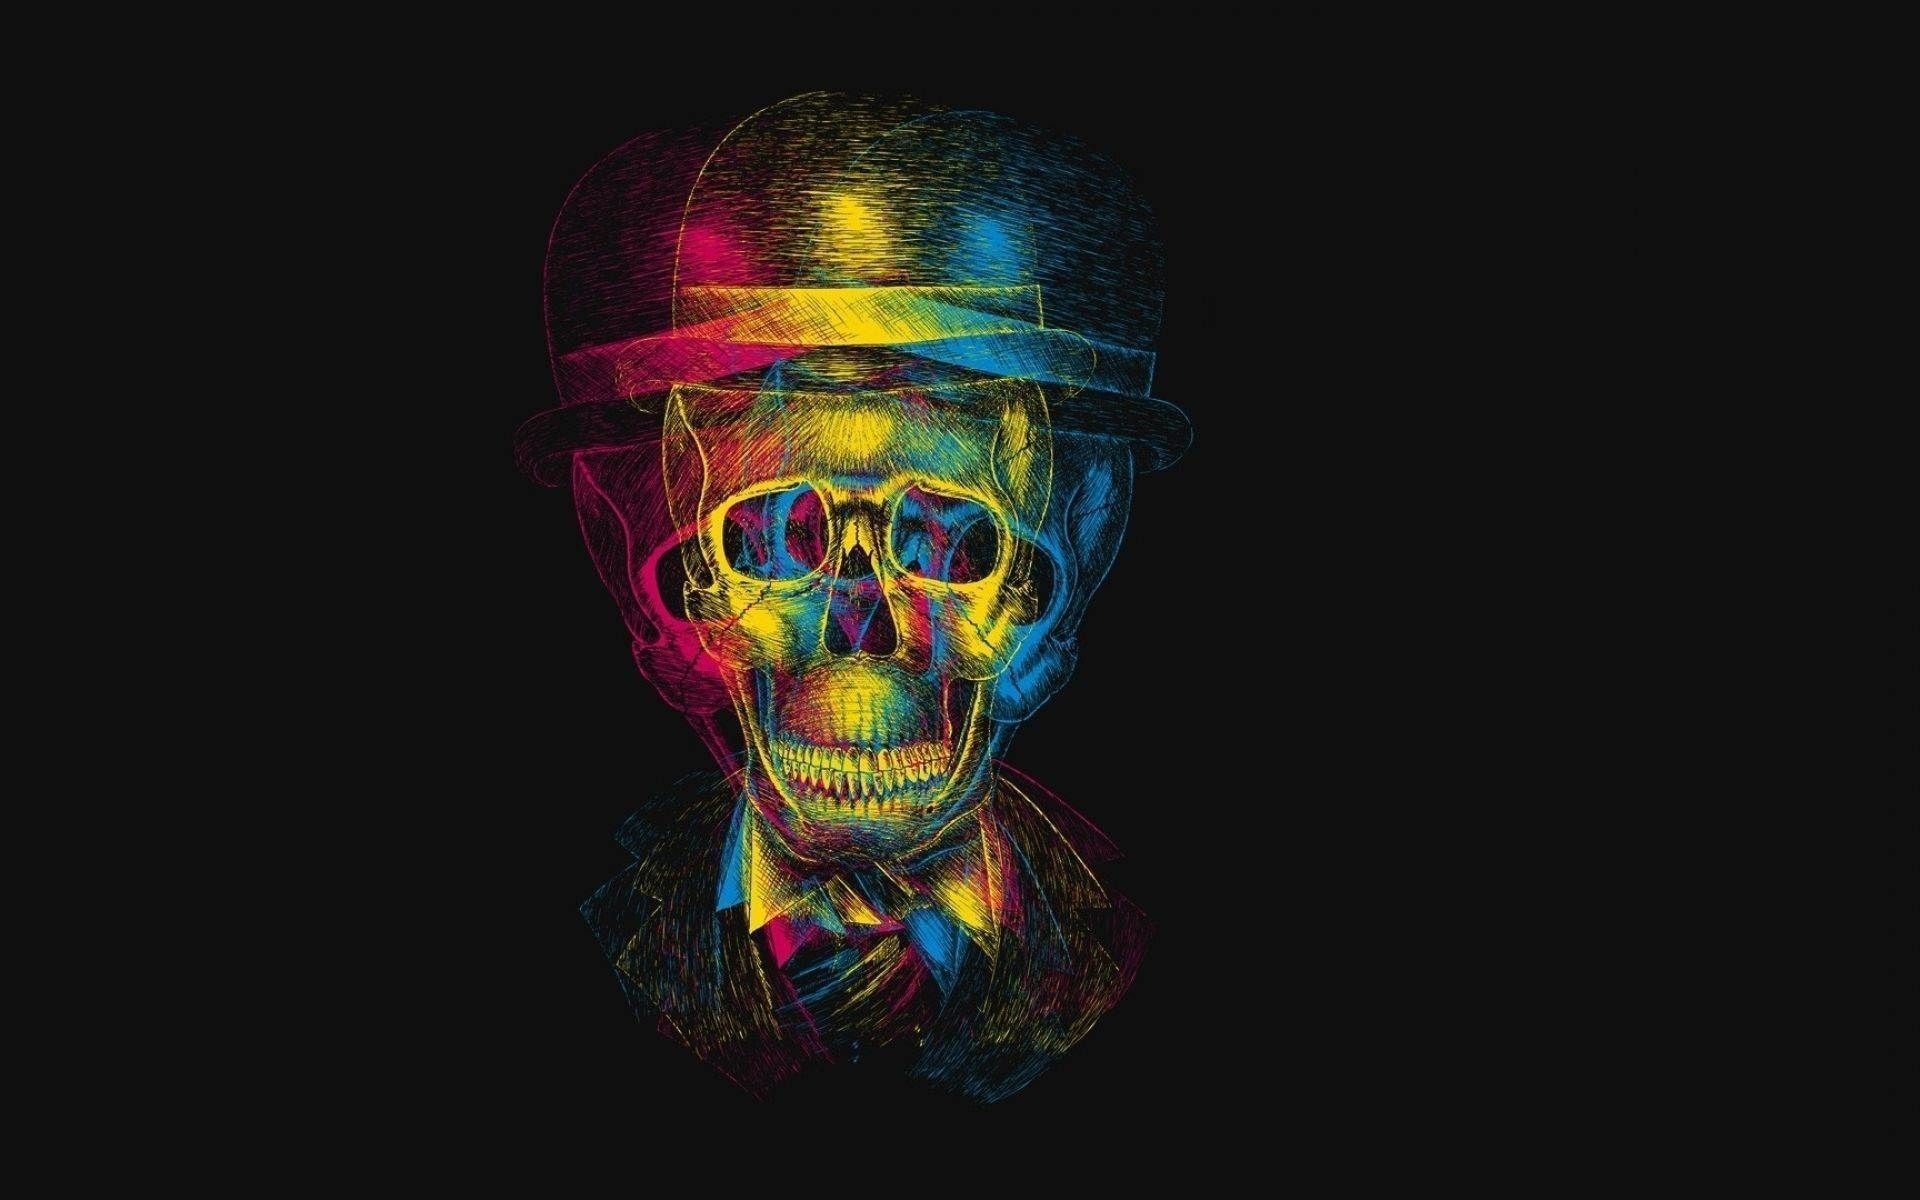 Punisher Skull Wallpaper Posted By Michelle Johnson